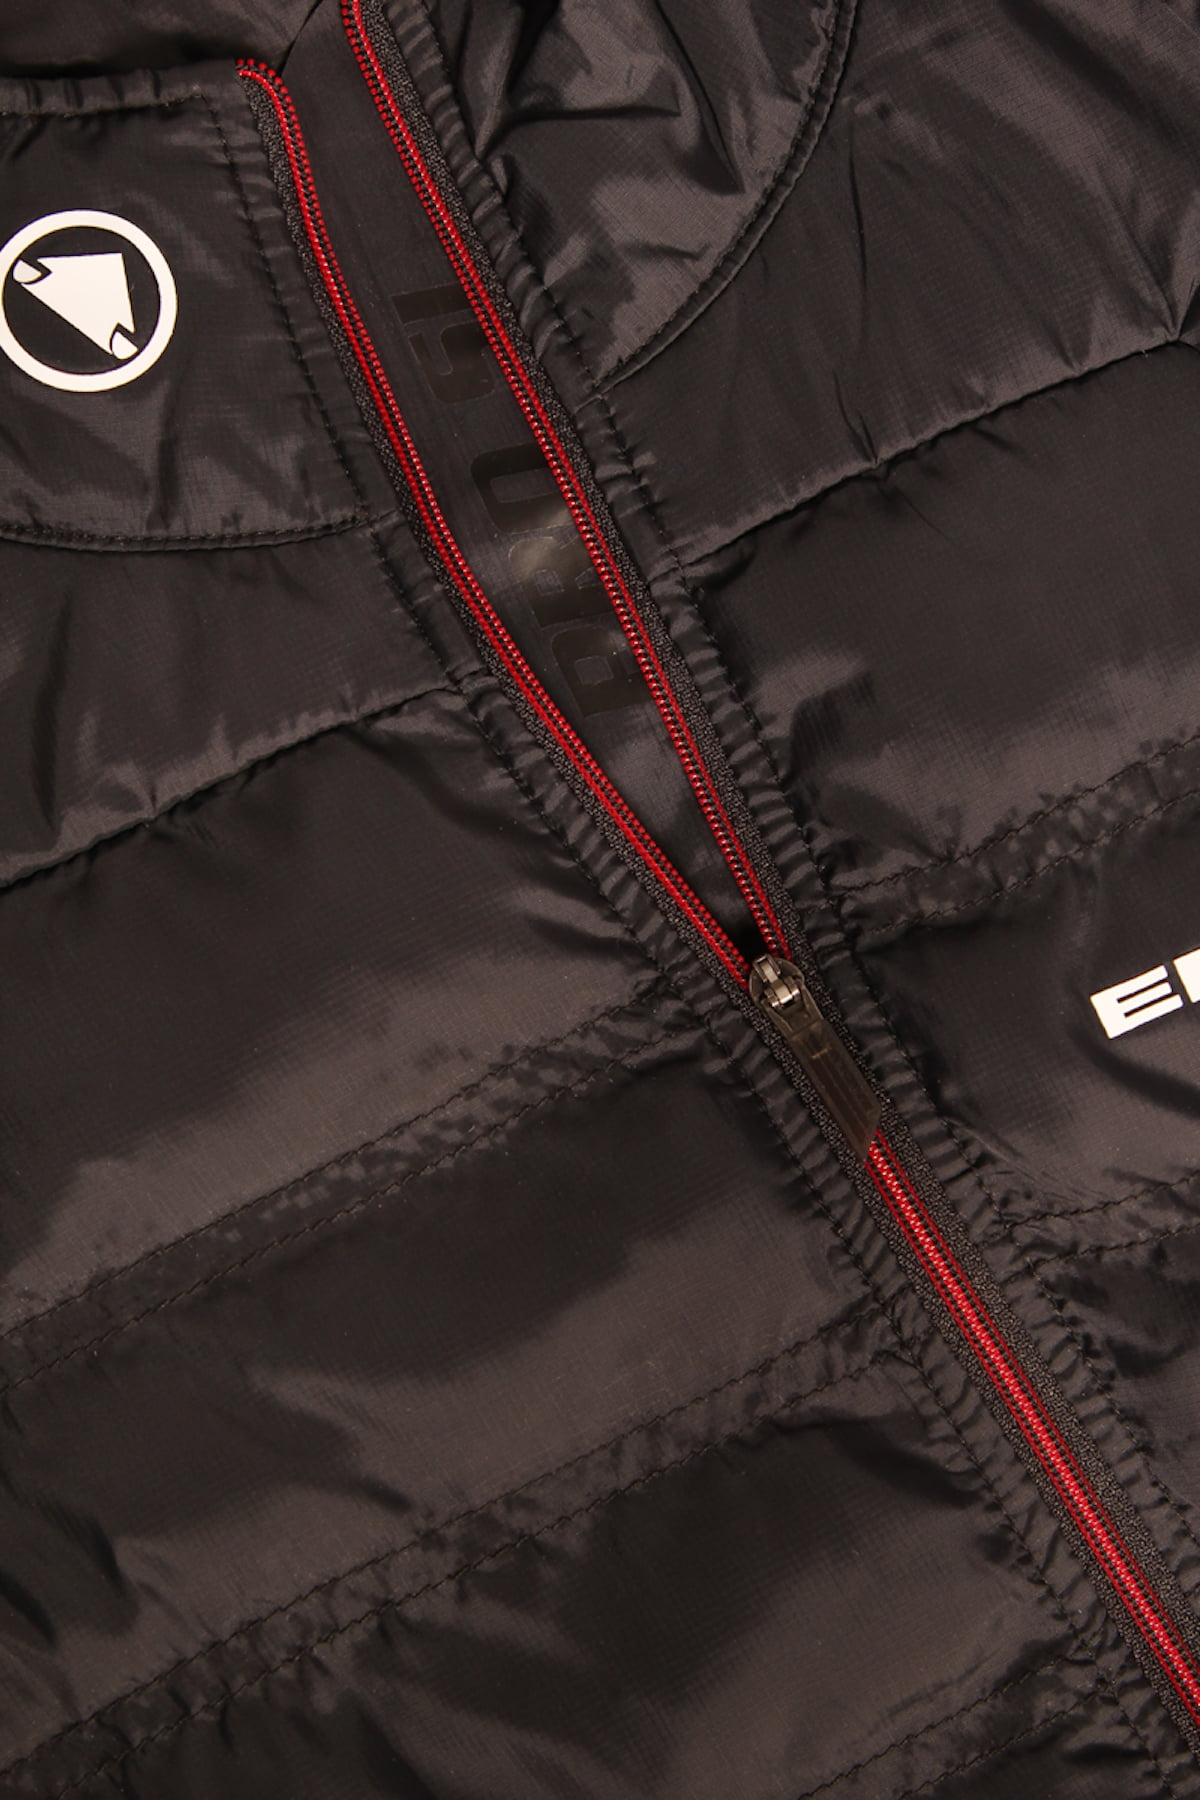 Pro-SL-Primaloft-Jacket-Detail-01